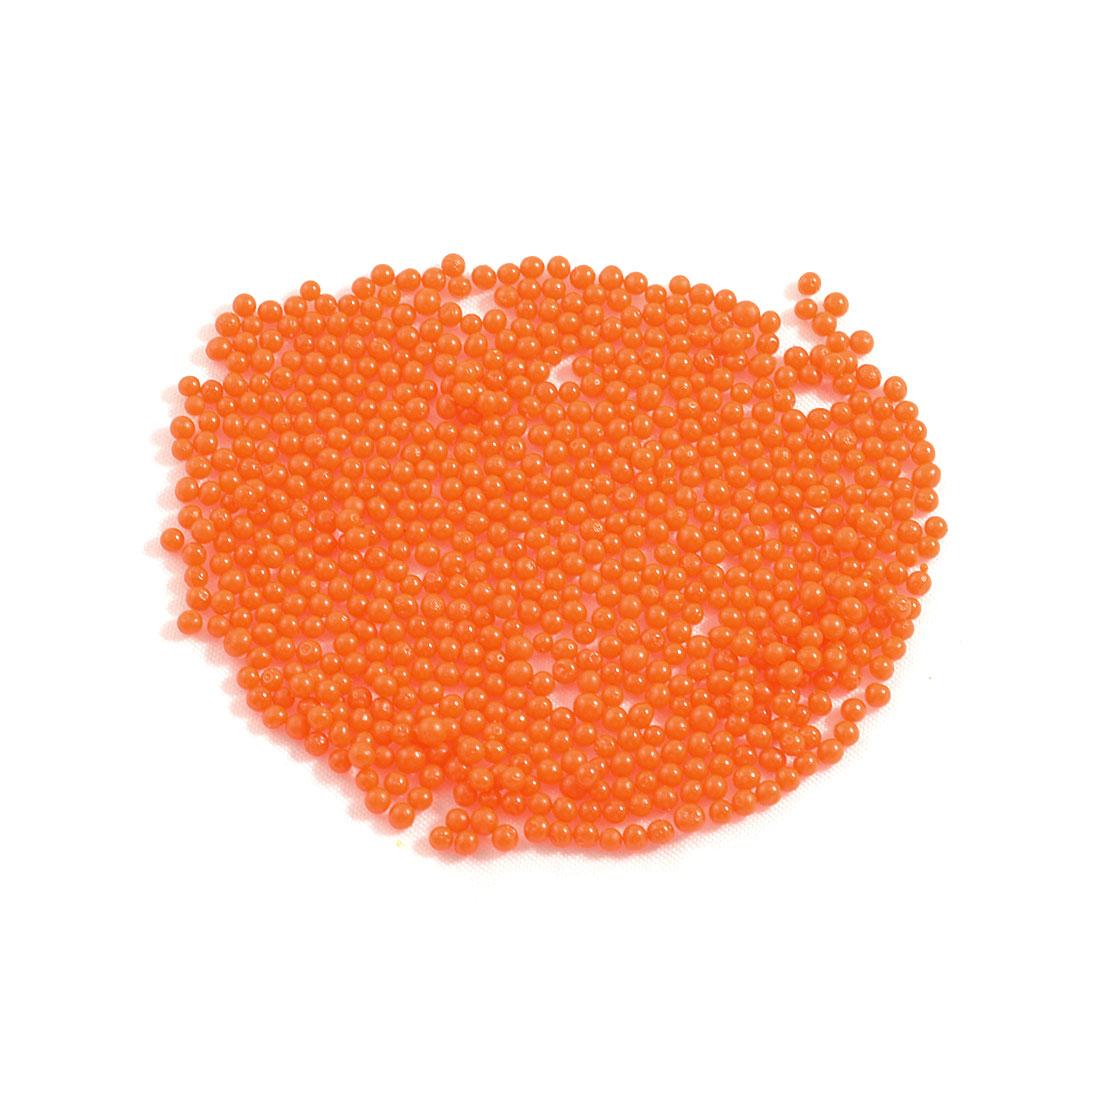 10 Bags 2-2.5mm Orange Granule Shaped Crystal Soil for Planting